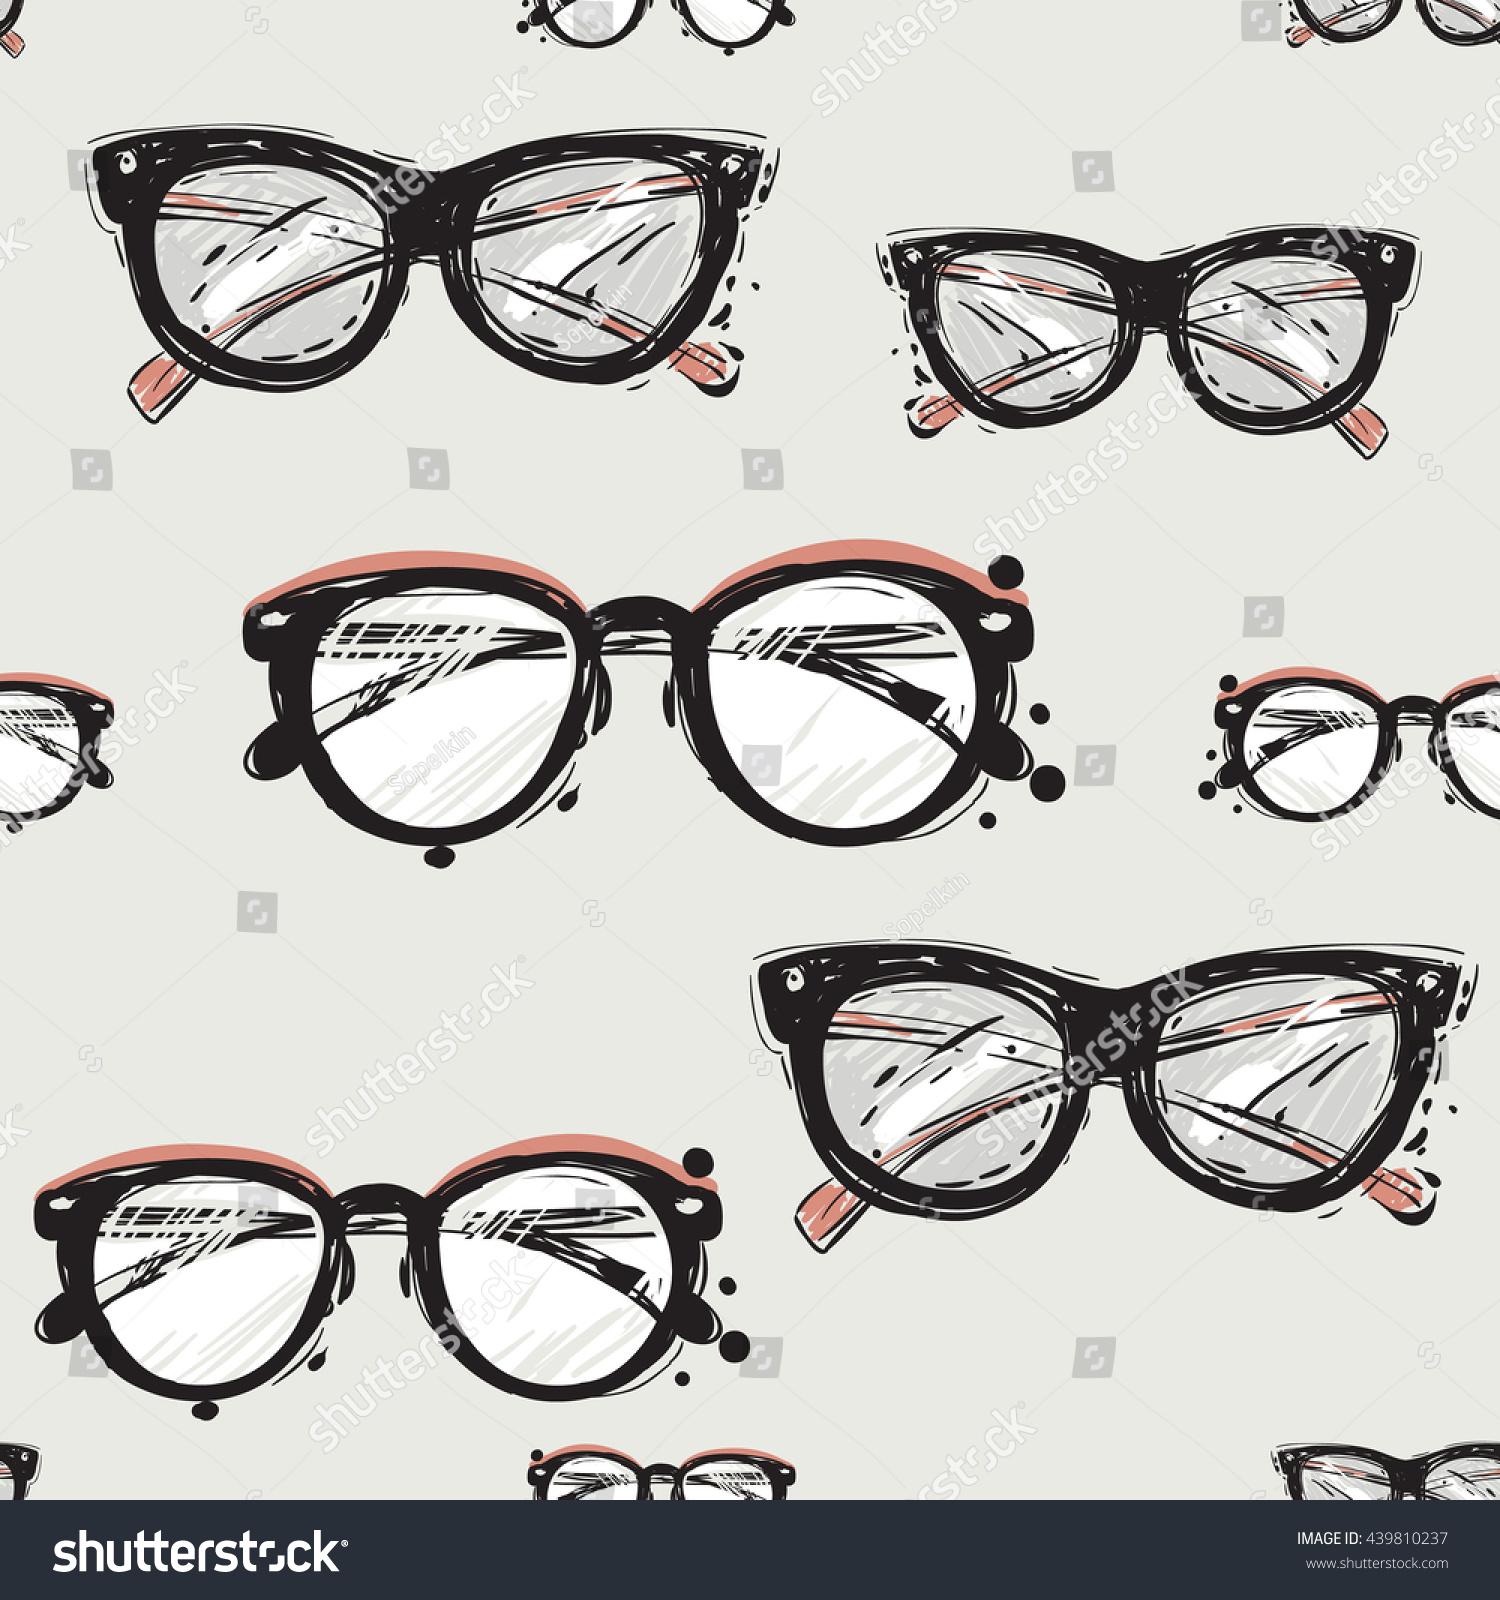 Vector Hand Drawn Graphic Fashion Illustration Stock Vector Royalty